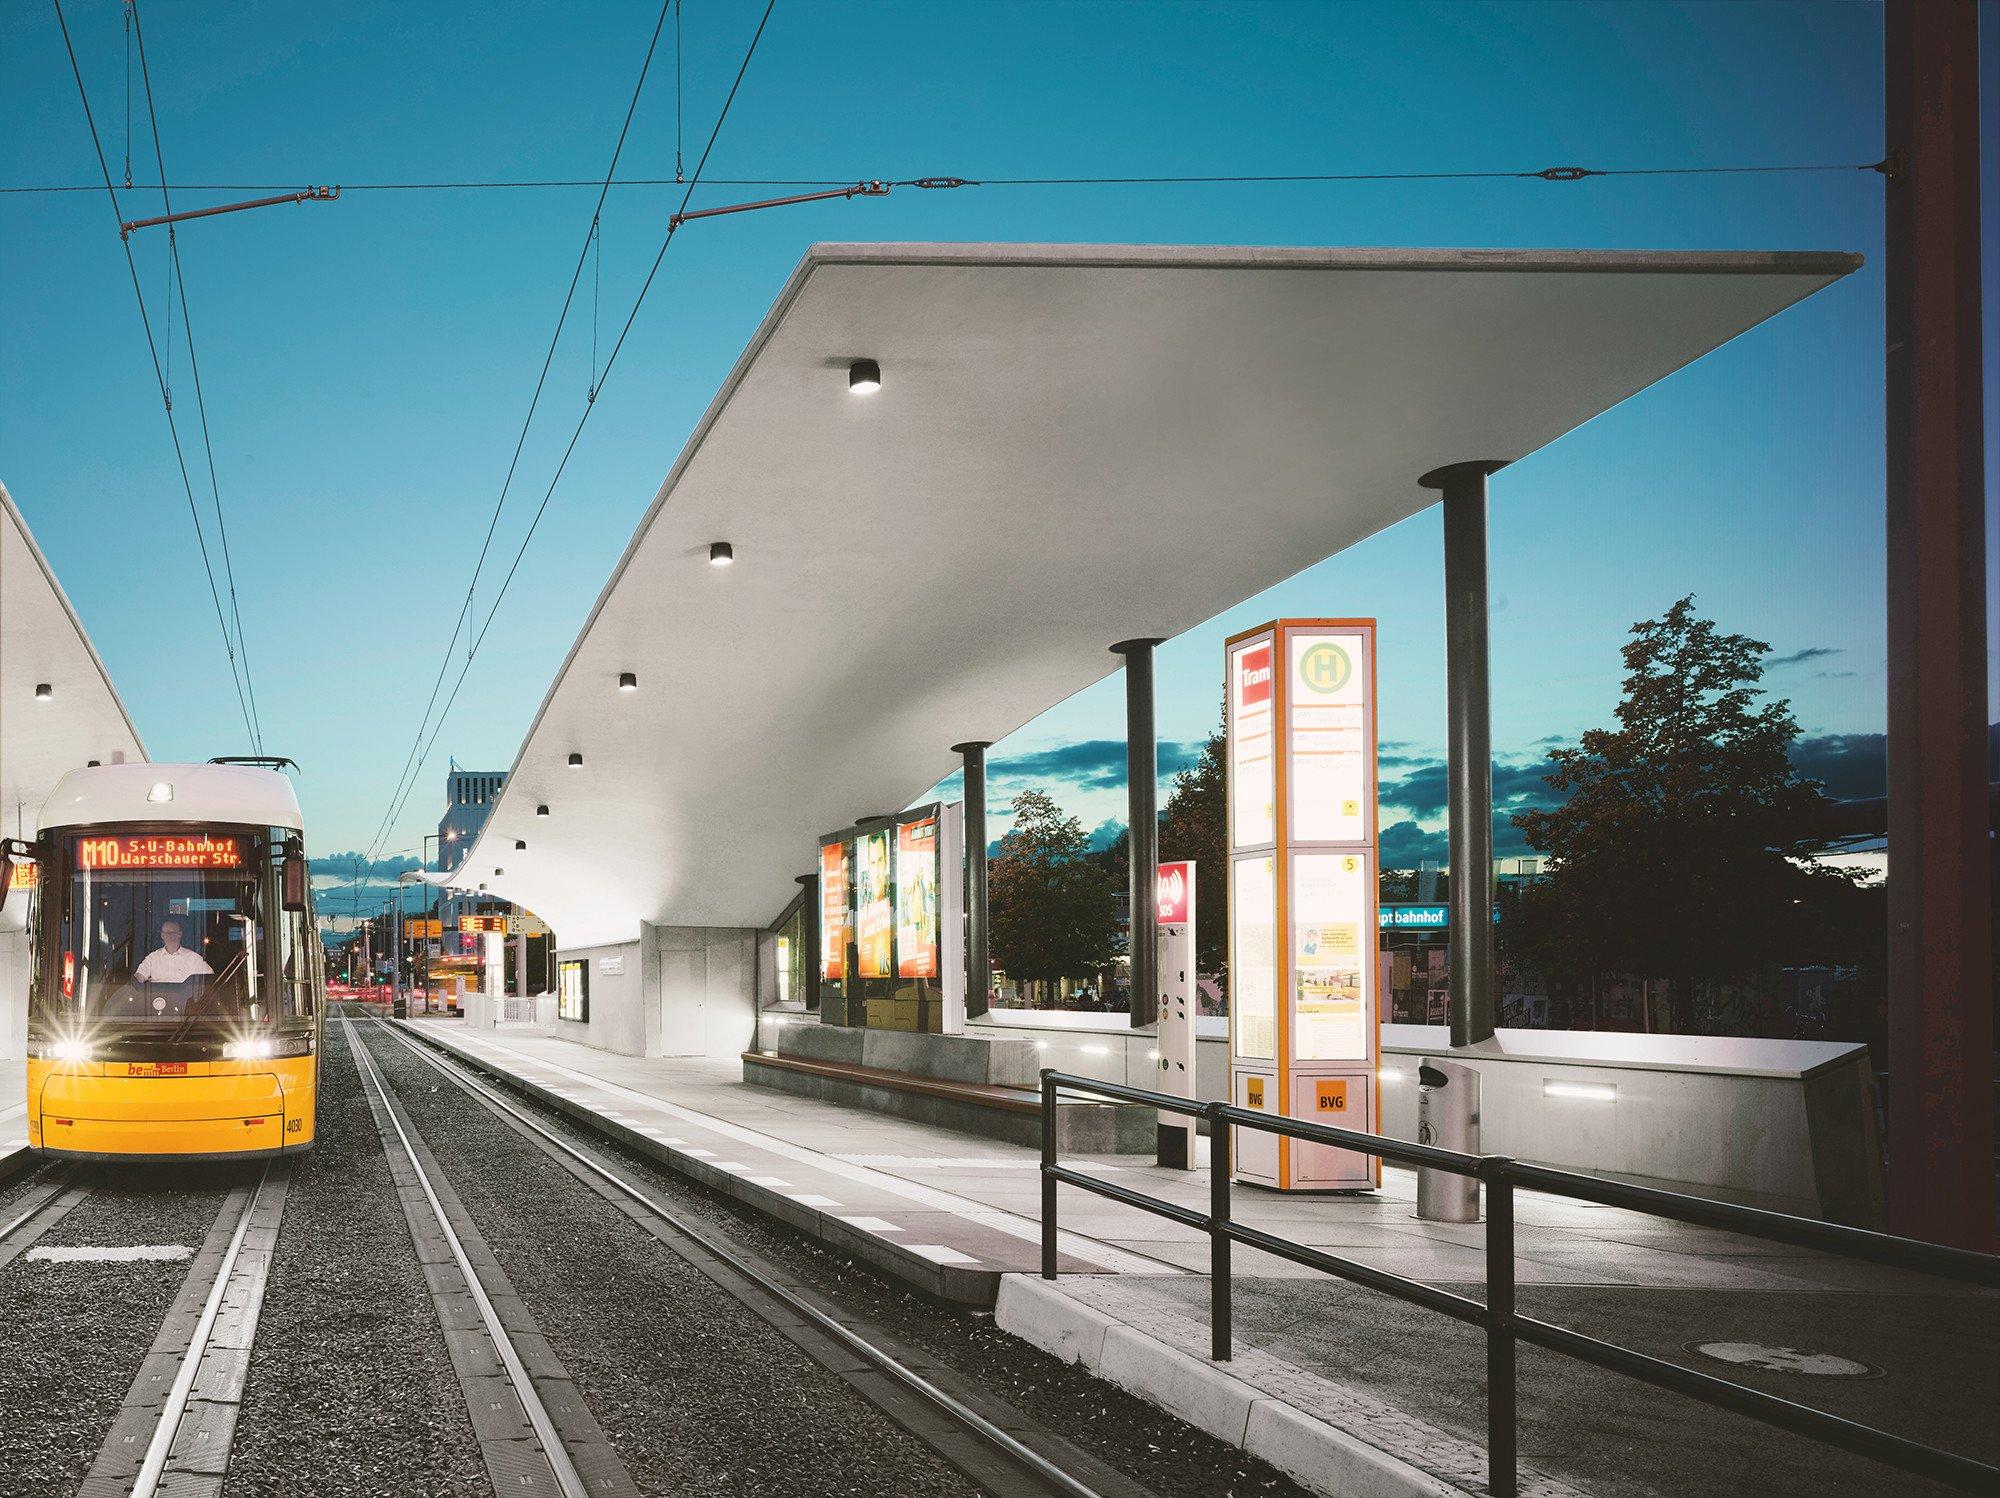 tram haltestelle am berliner hauptbahnhof beton. Black Bedroom Furniture Sets. Home Design Ideas